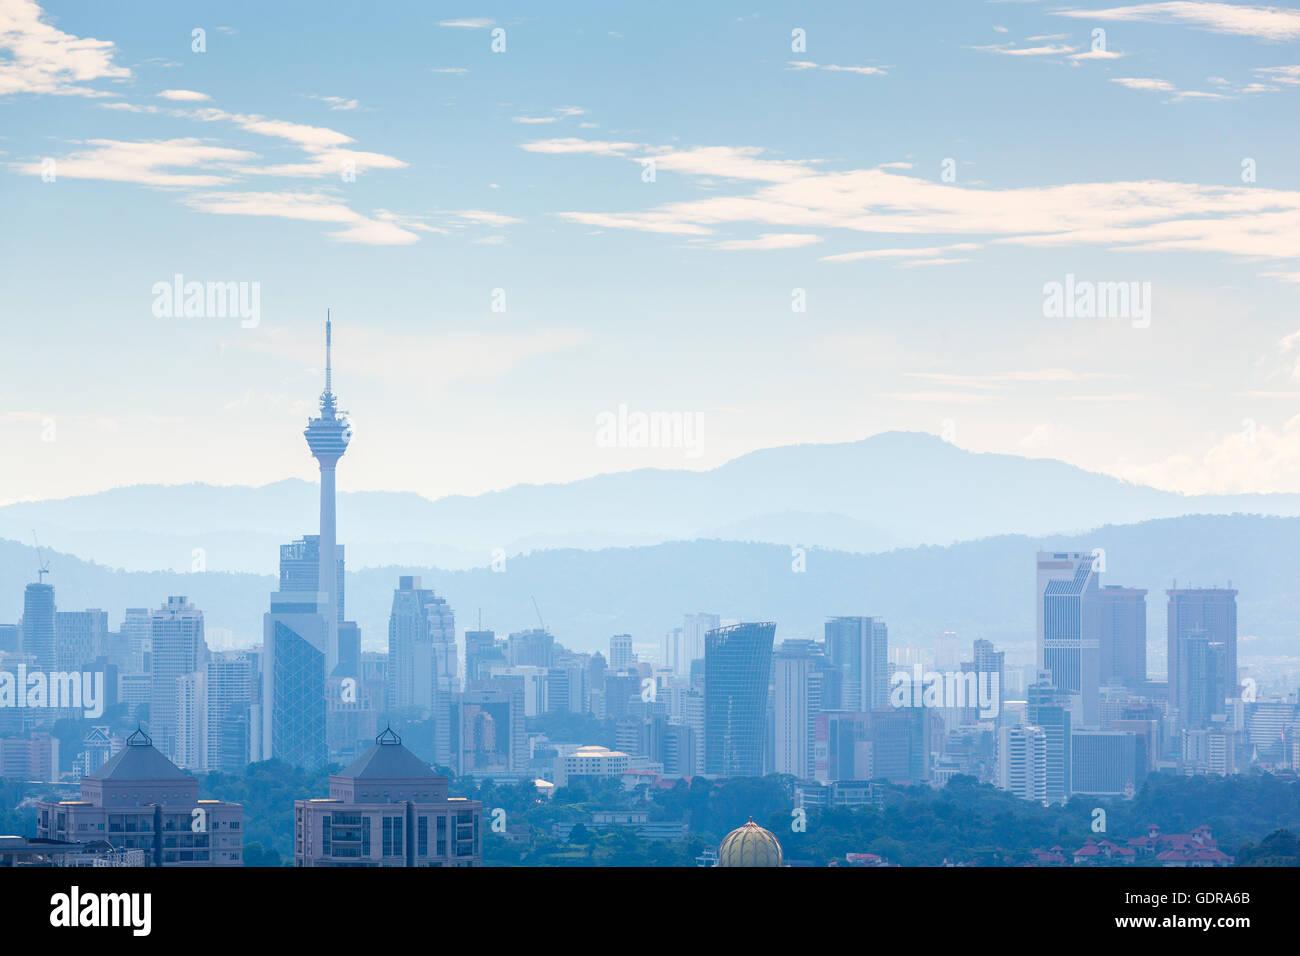 Kuala Lumpur cityscape at noon, hazy day, west of Kuala Lumpur - Stock Image